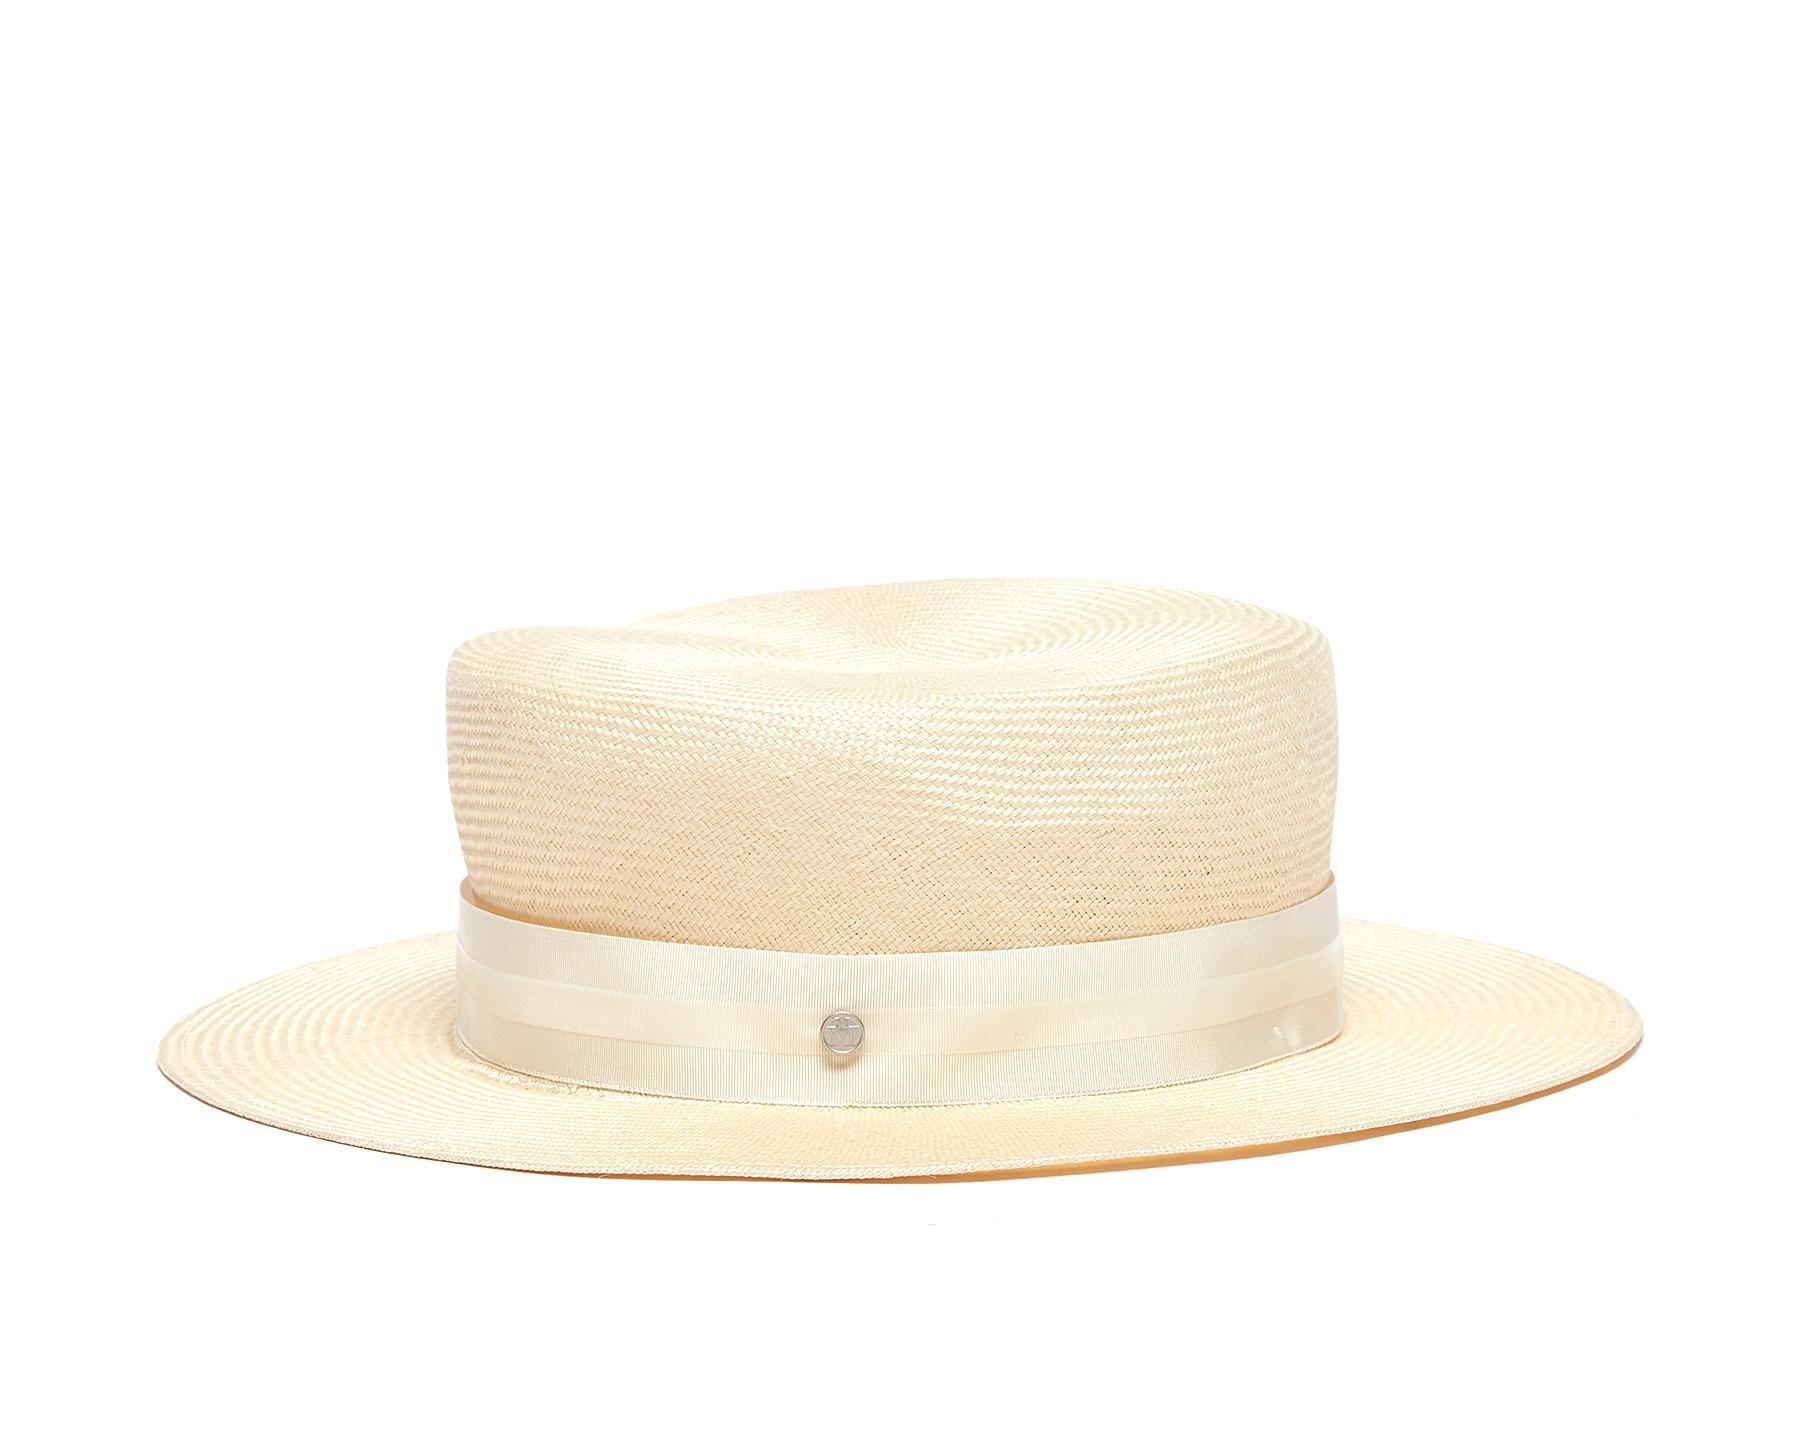 △  Maison Michel 'Kiki' Straw Canotier Hat  US$670 (~HK$5259)